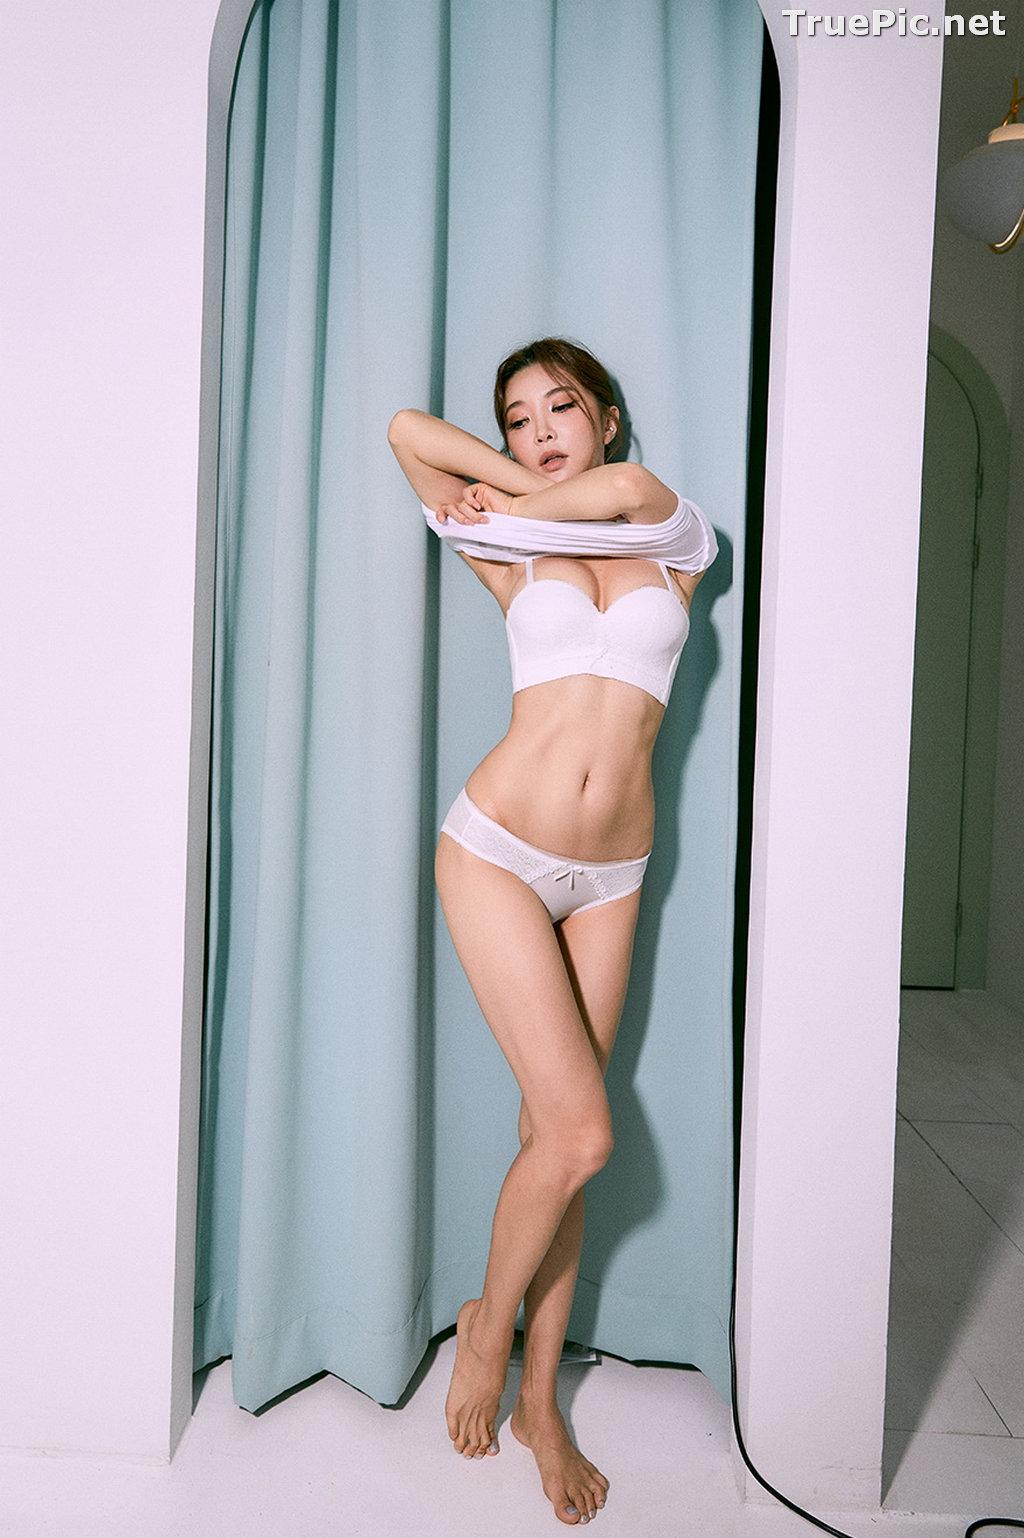 Image Korean Fashion Model - Park Soo Yeon - Open Up Lingerie - TruePic.net - Picture-5